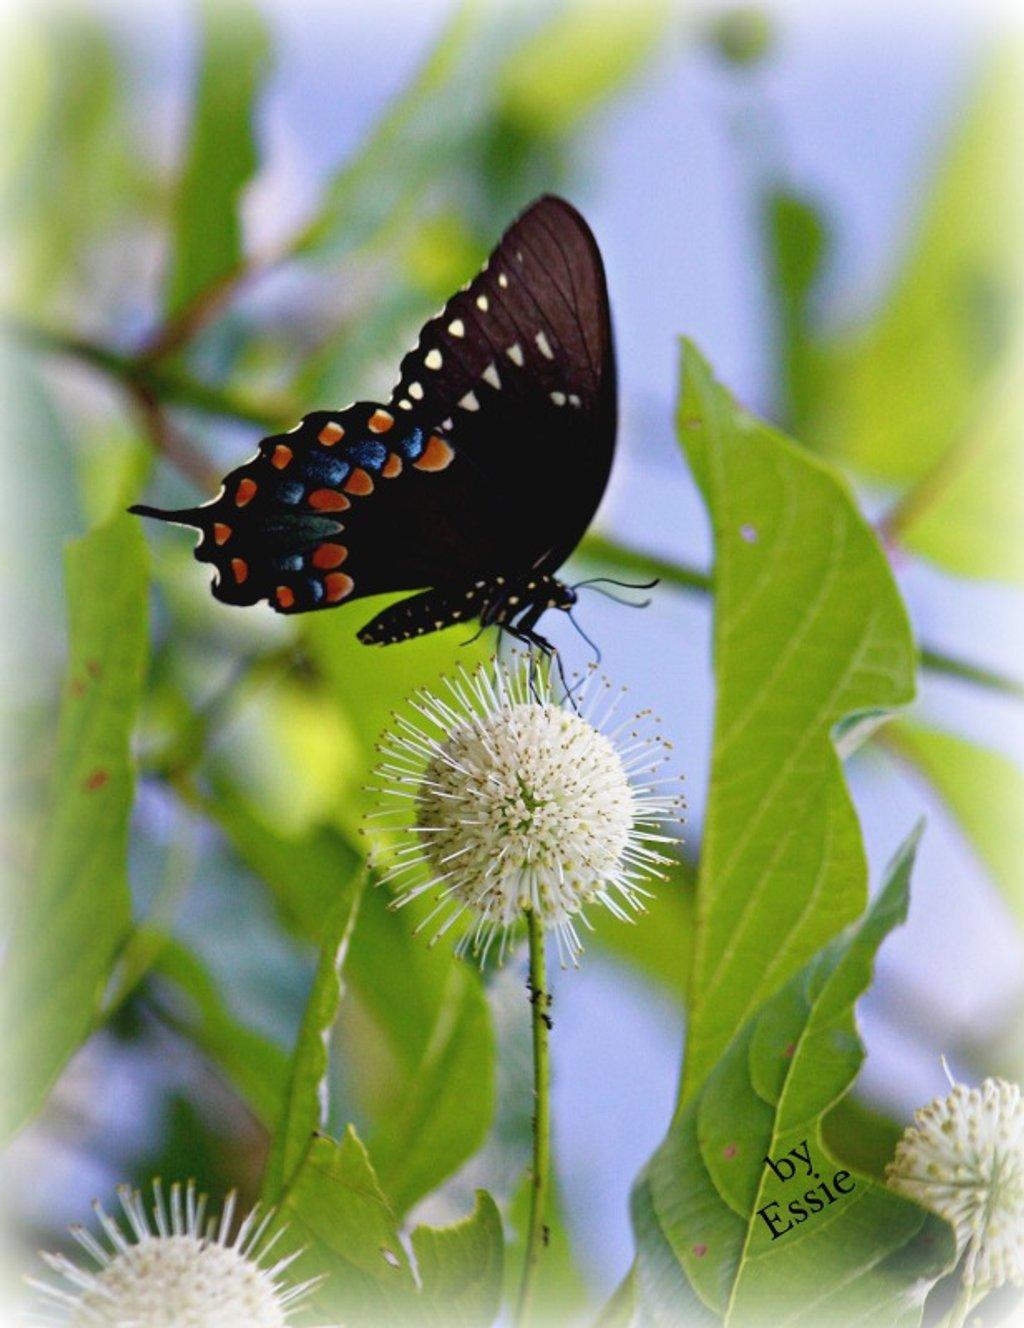 B & B  (Butterfly on Button Bush) by essiesue